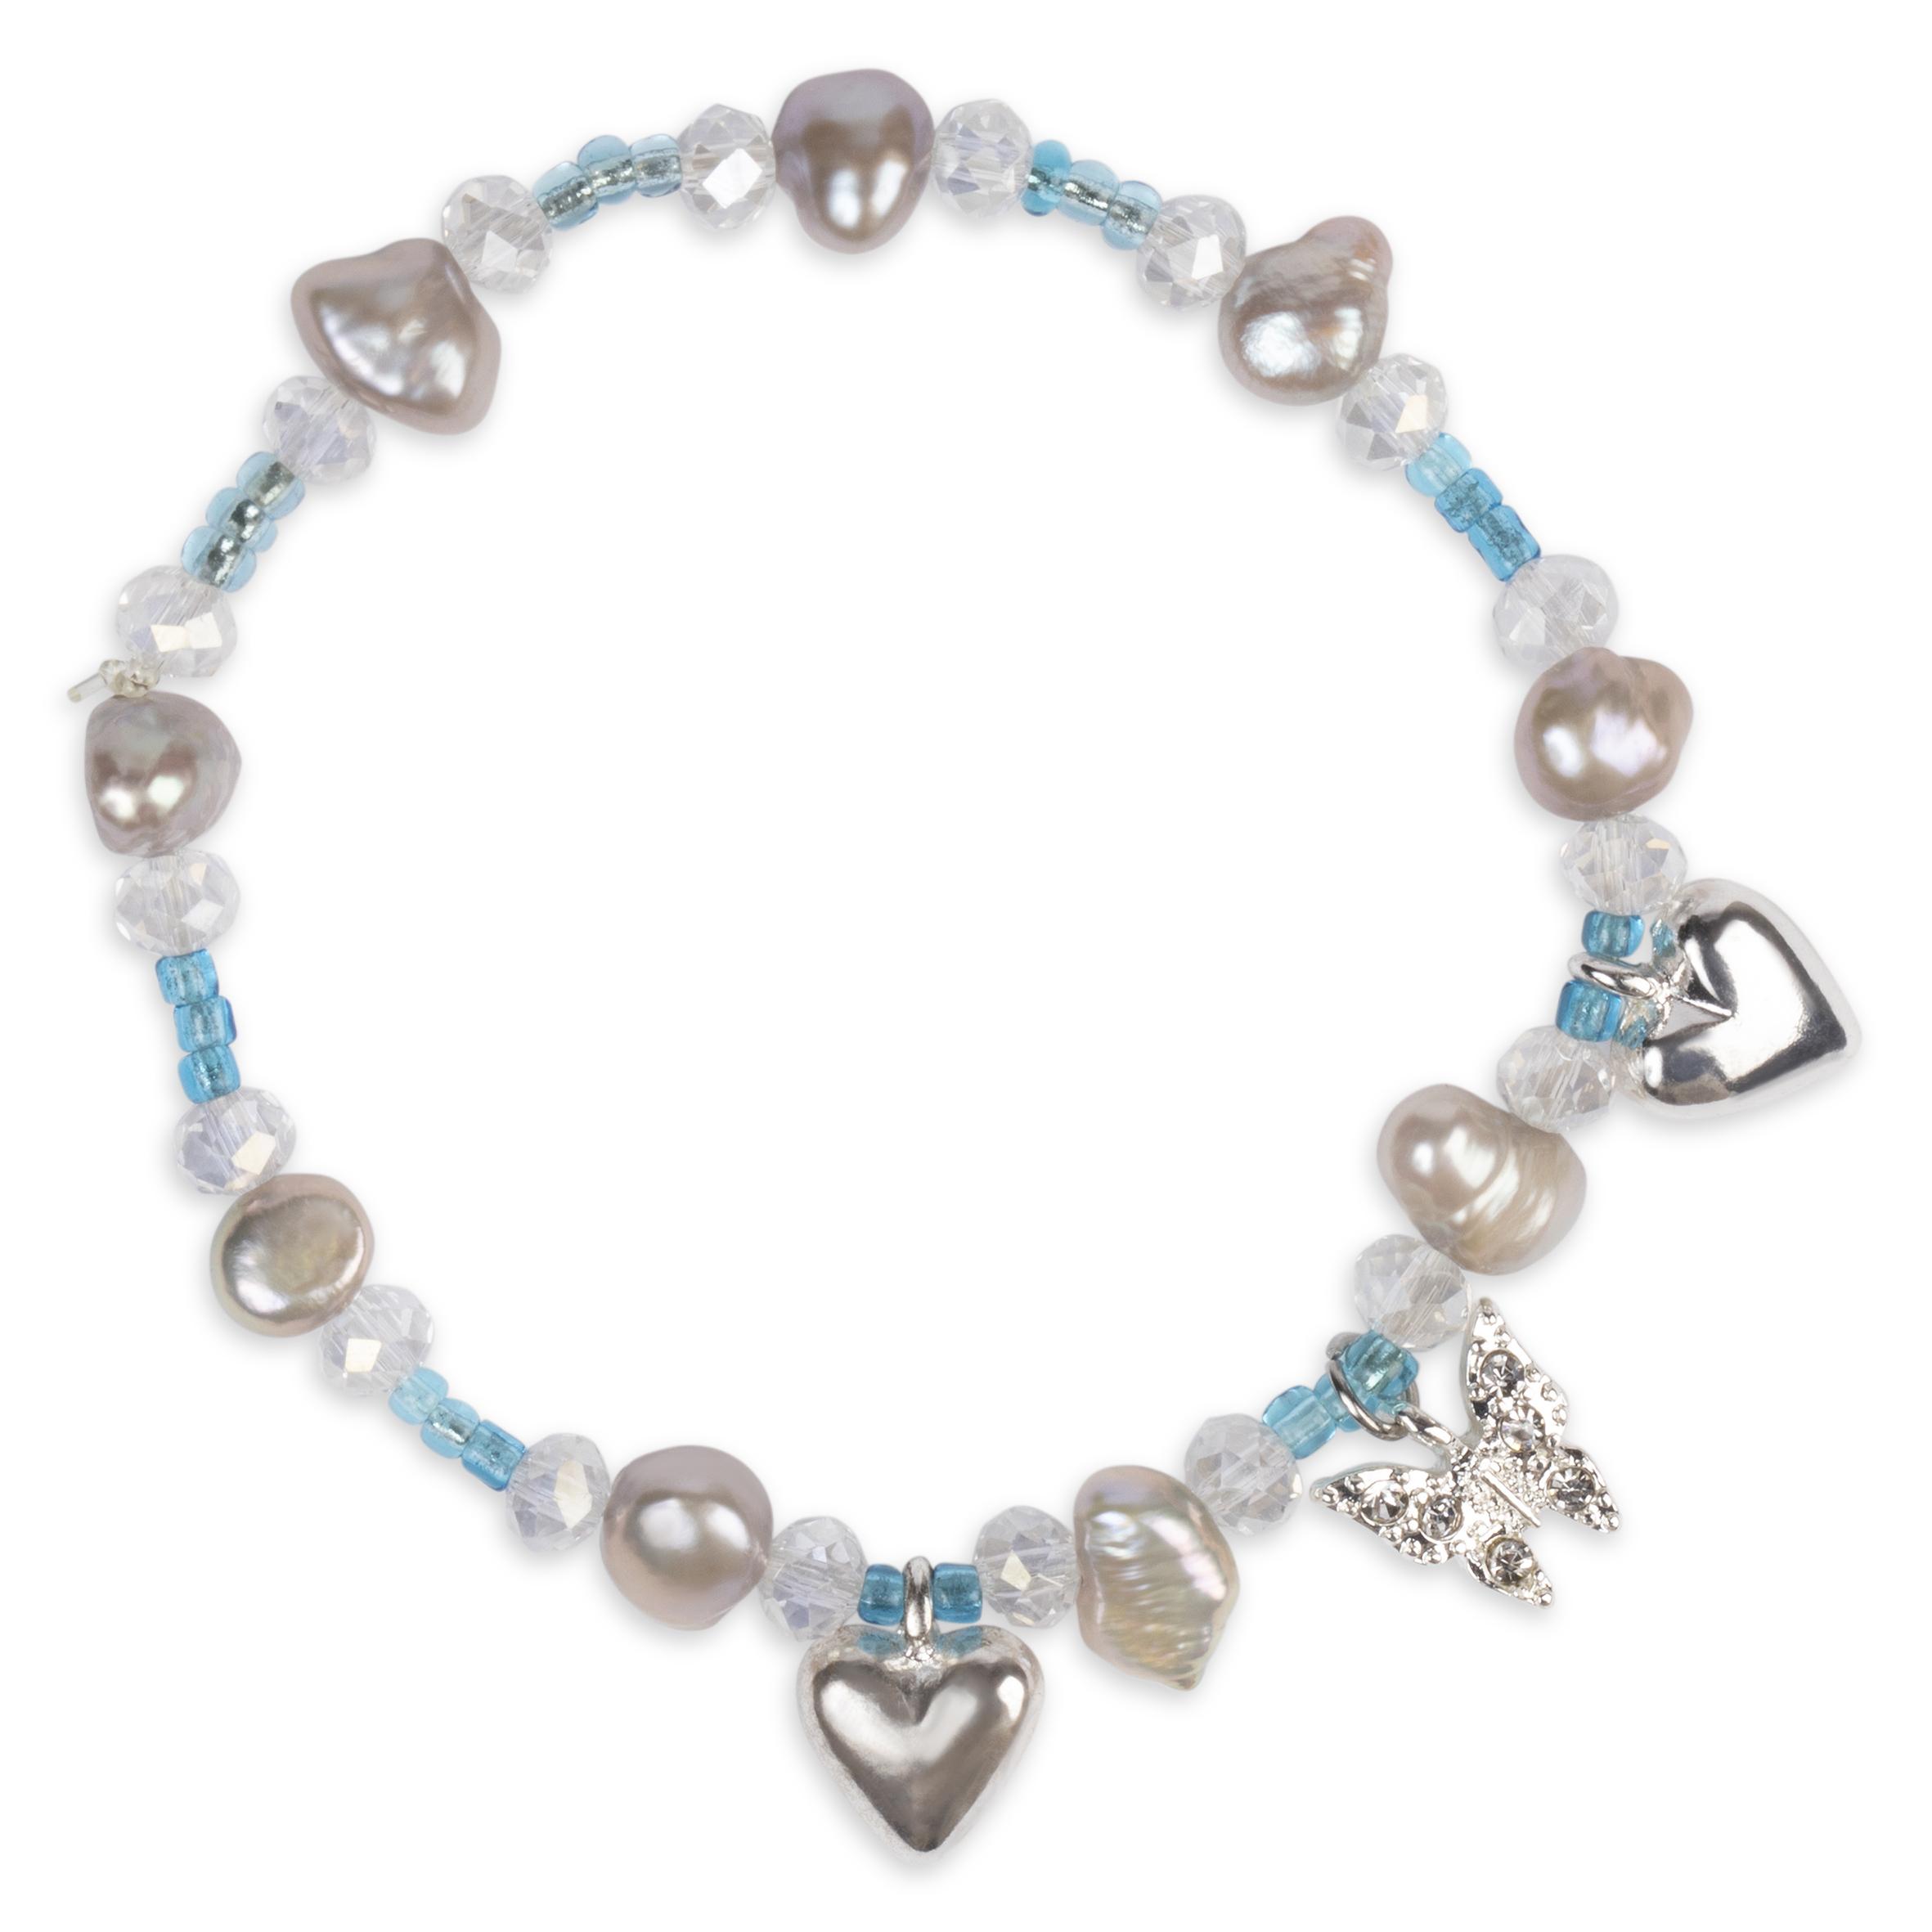 Barnsmycke pfg Stockholm Pearls Kids-Kelly Bracelet 11011-12